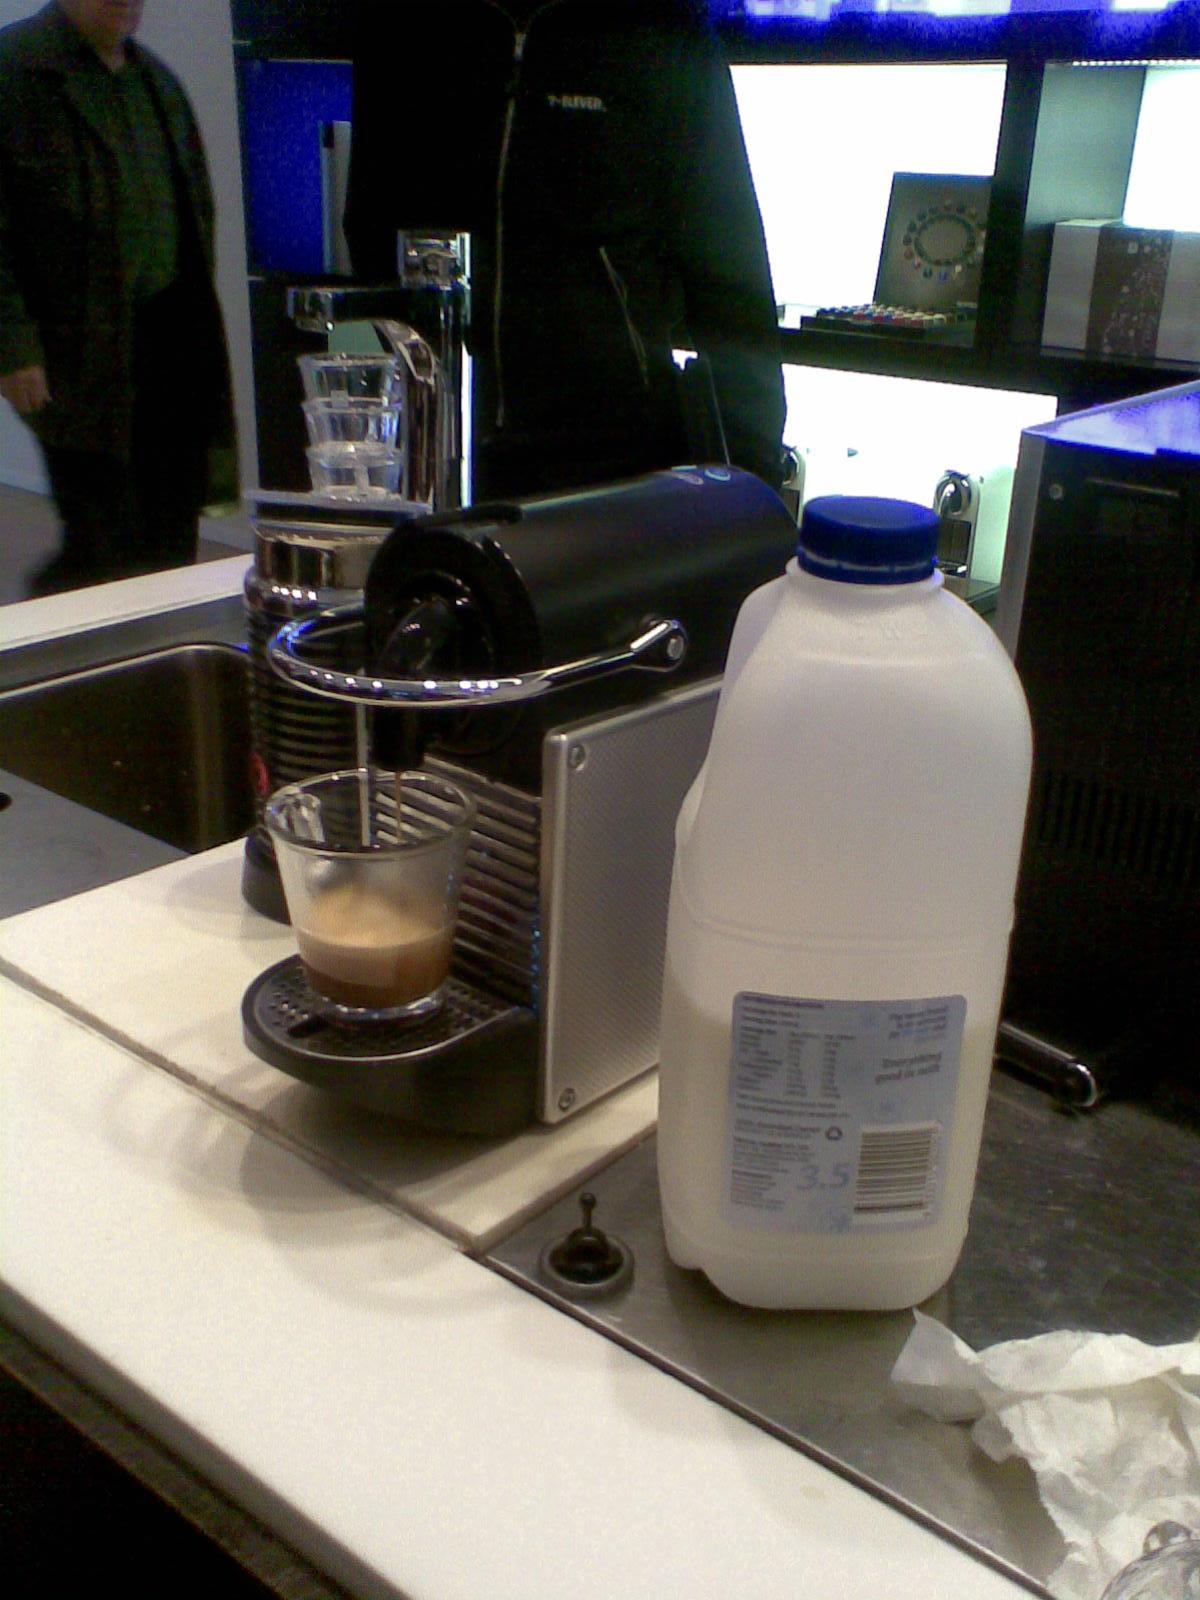 Nespresso Cafe Chocolat